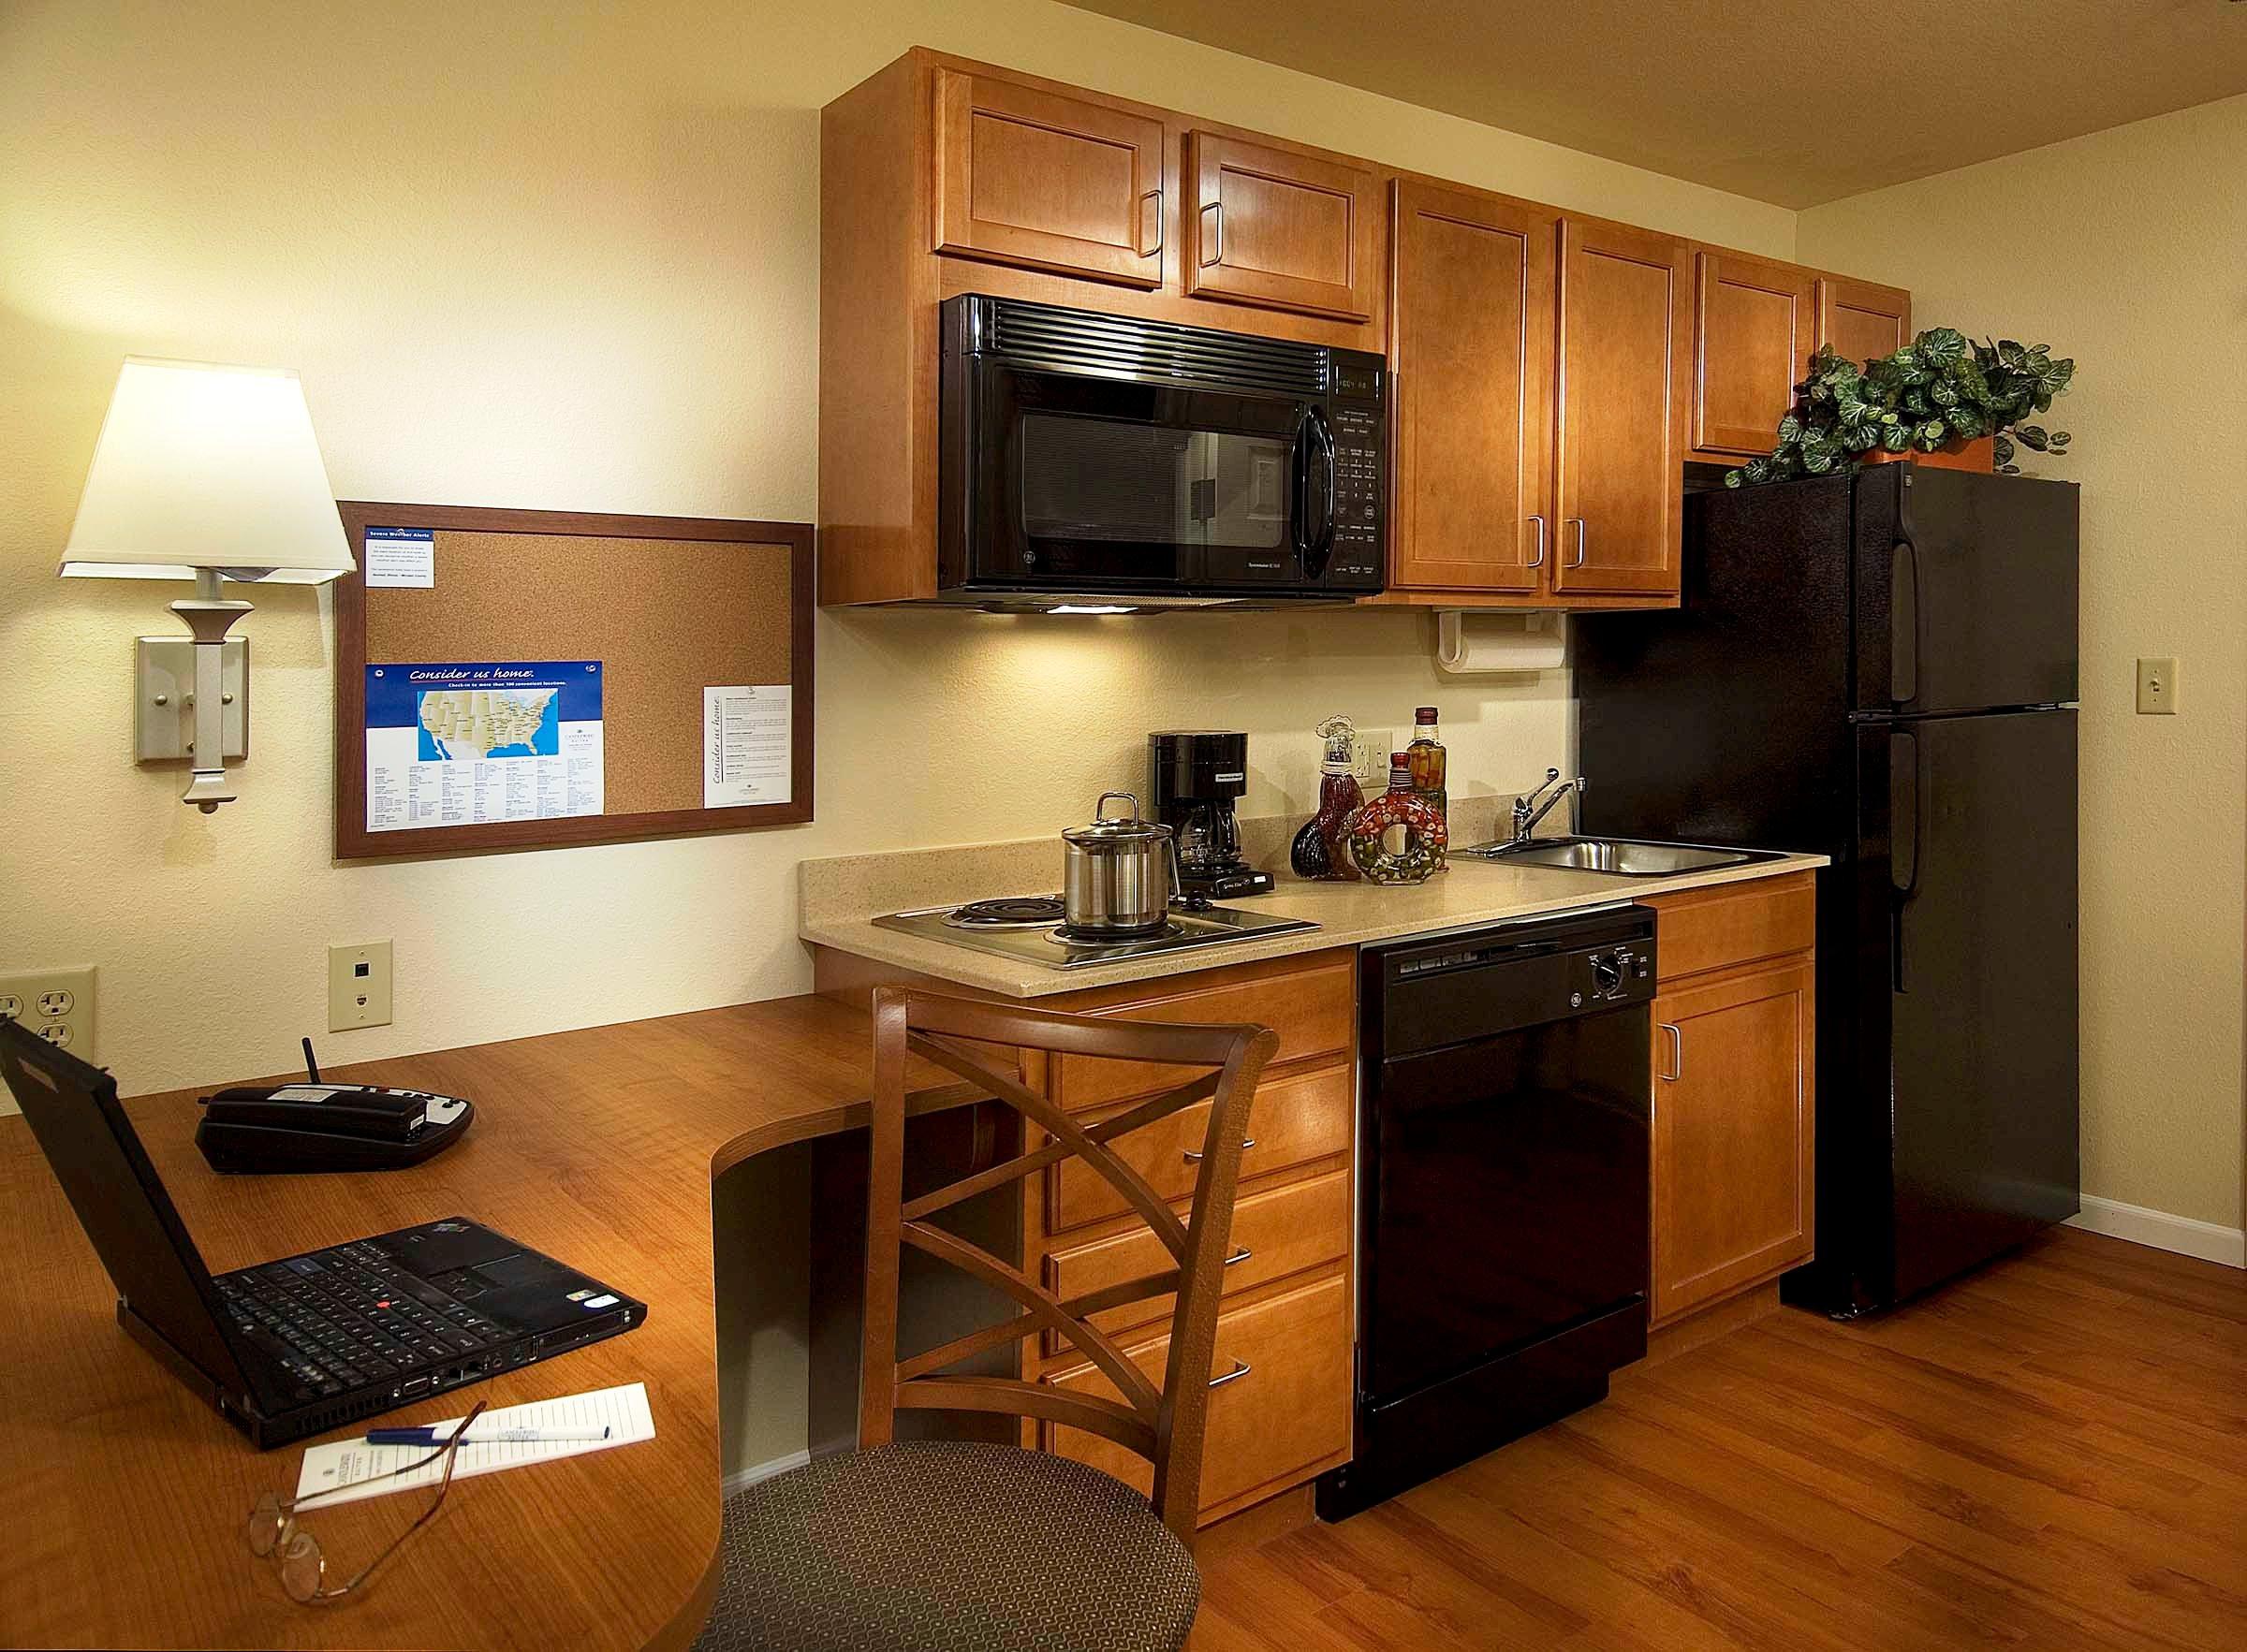 Mal kuchyn zvolte sv tl barvy a leskl materi ly for Designhotel definition